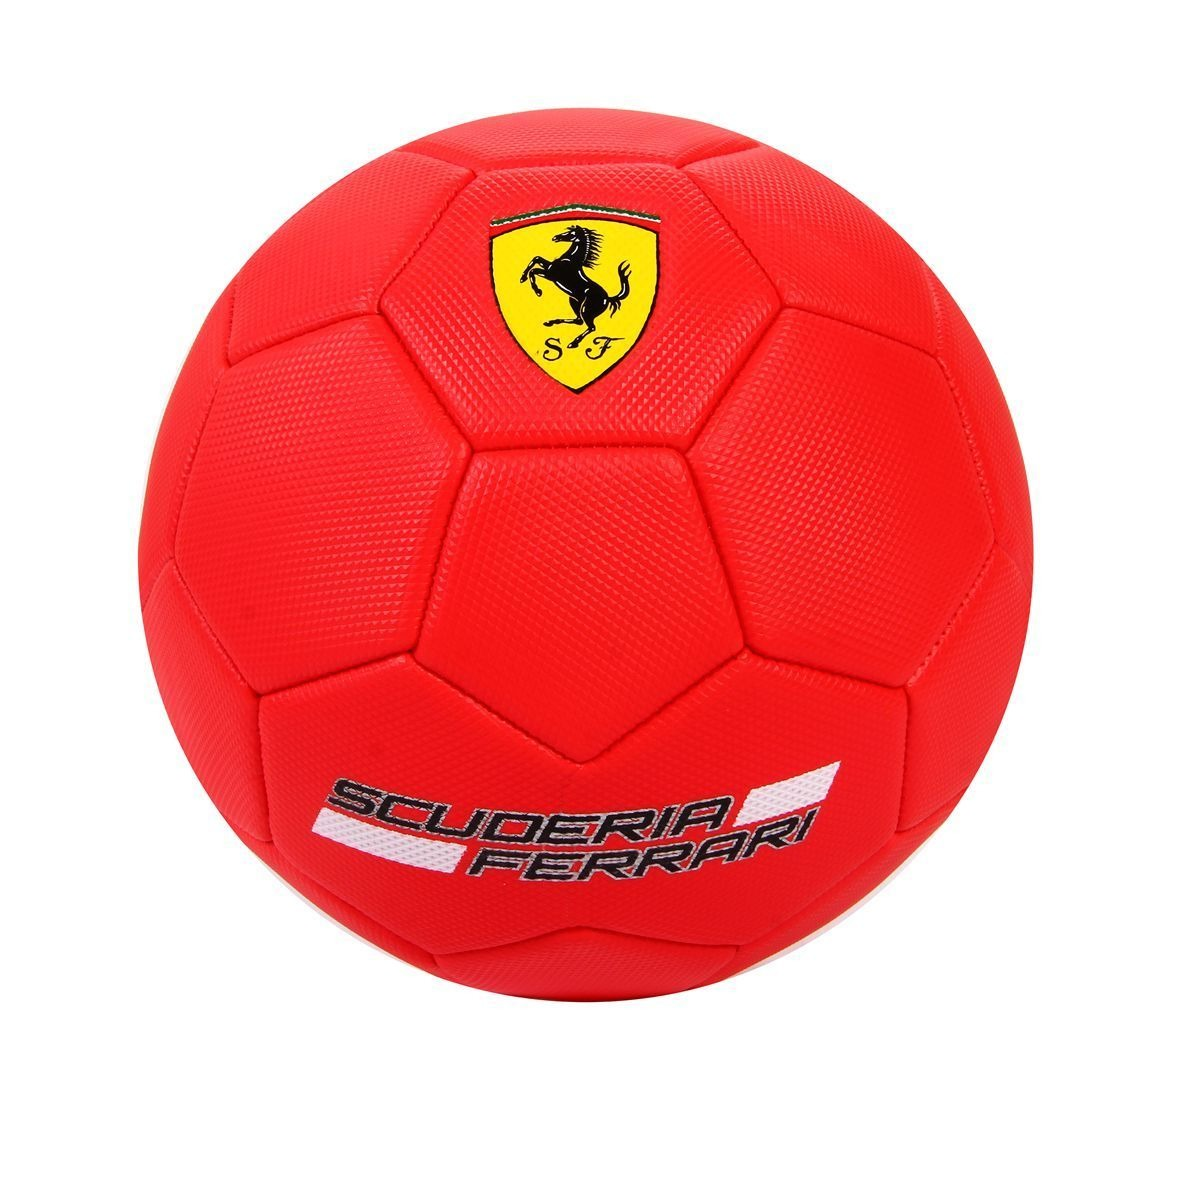 Ferrari soccer ball size 3 czerwony ferrari accessories